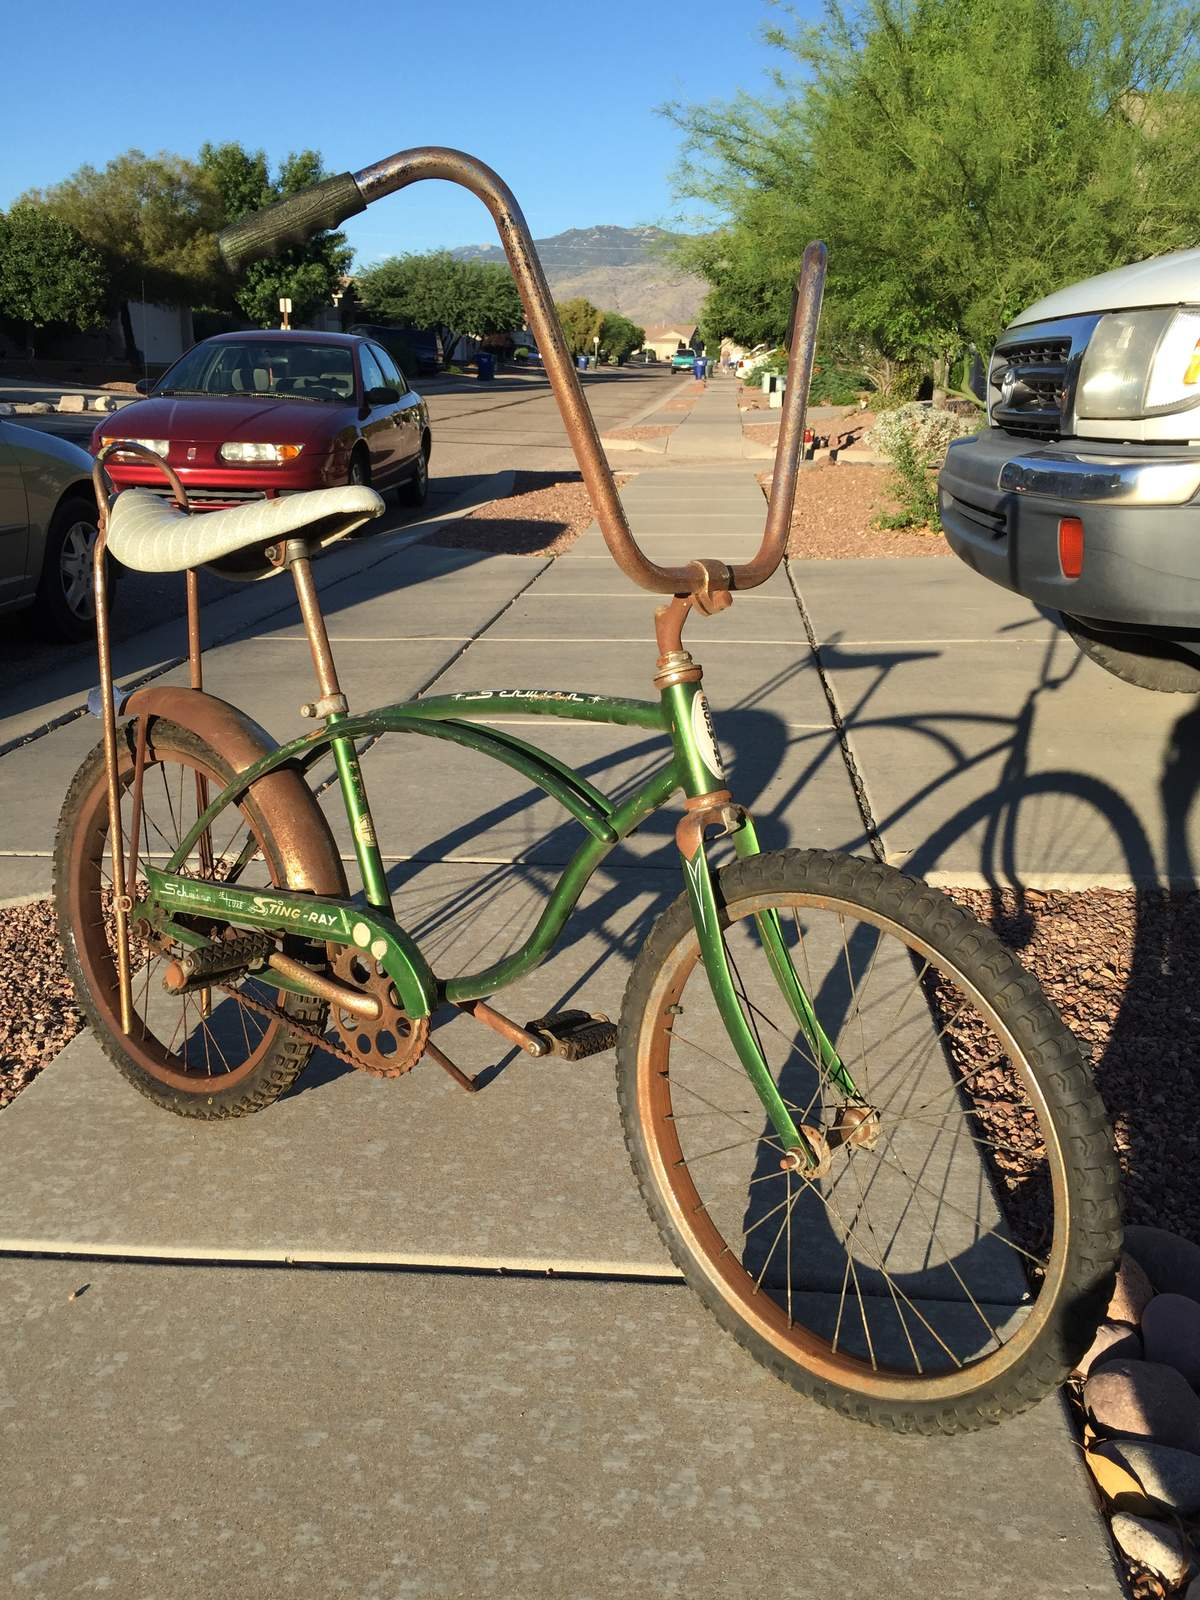 Schwinn Stingray Bikes For Sale On Craigslist